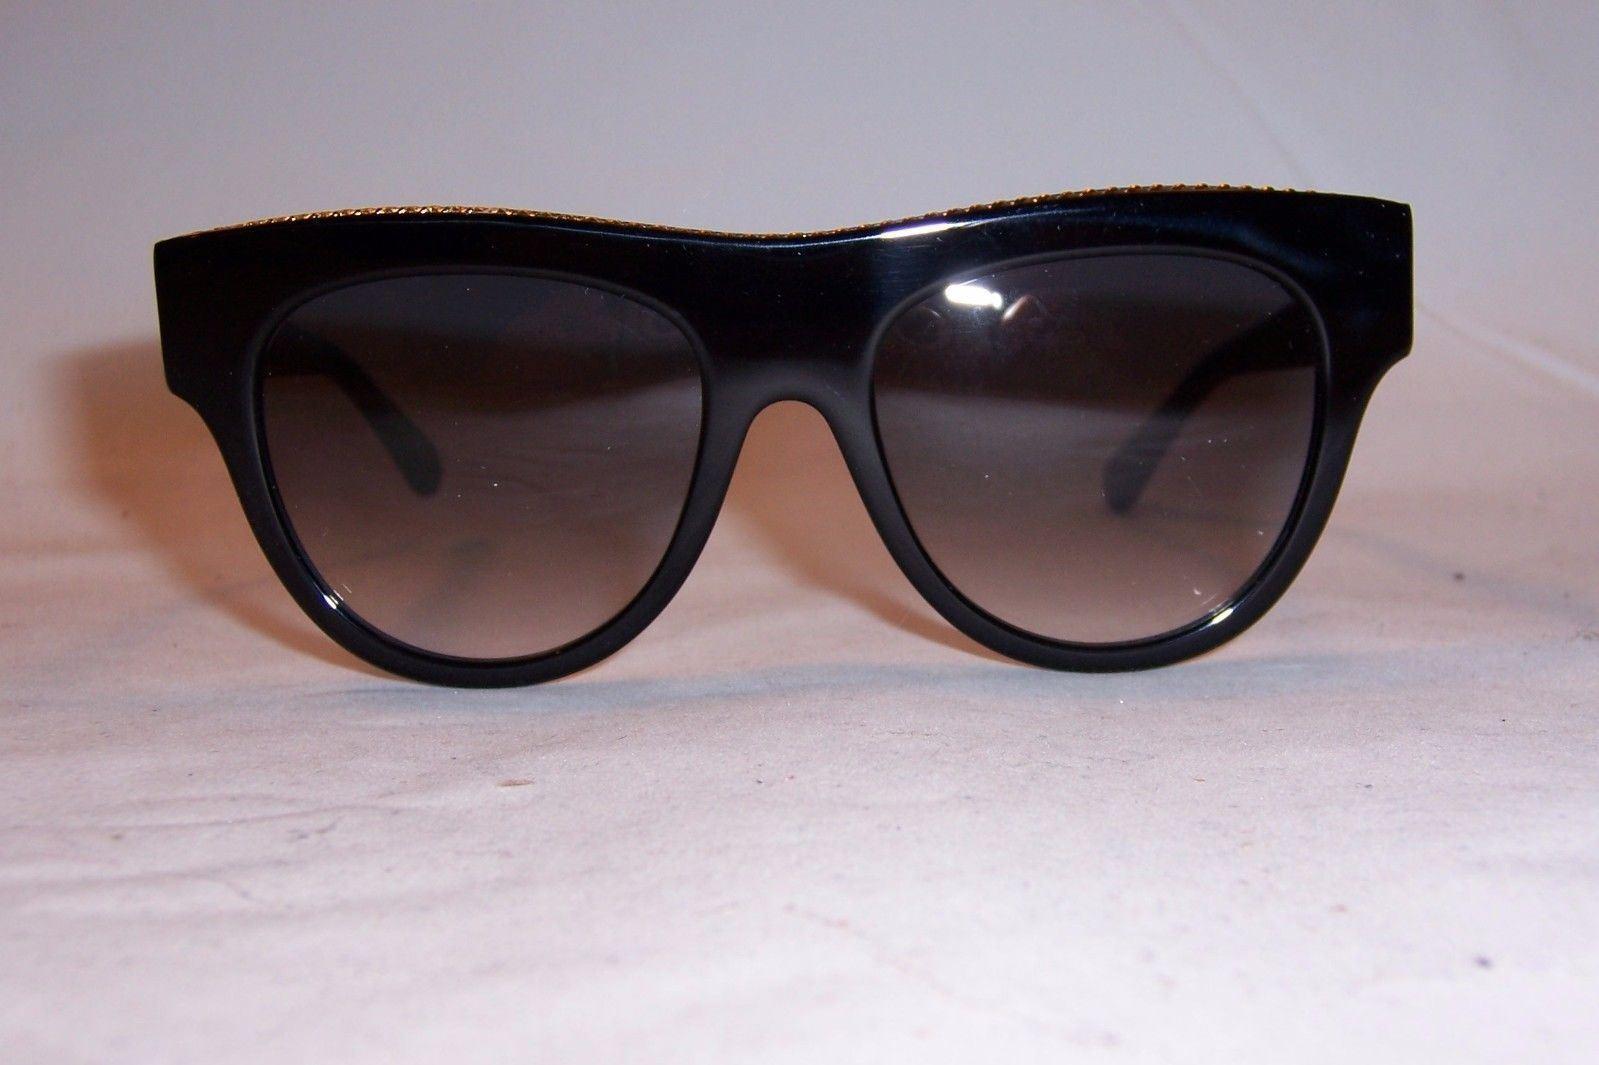 Stella McCartney Women s SC 0017s 0017 s 001 Black gold Cat Eye Sunglasses  51mm   eBay 2053d9665ae9